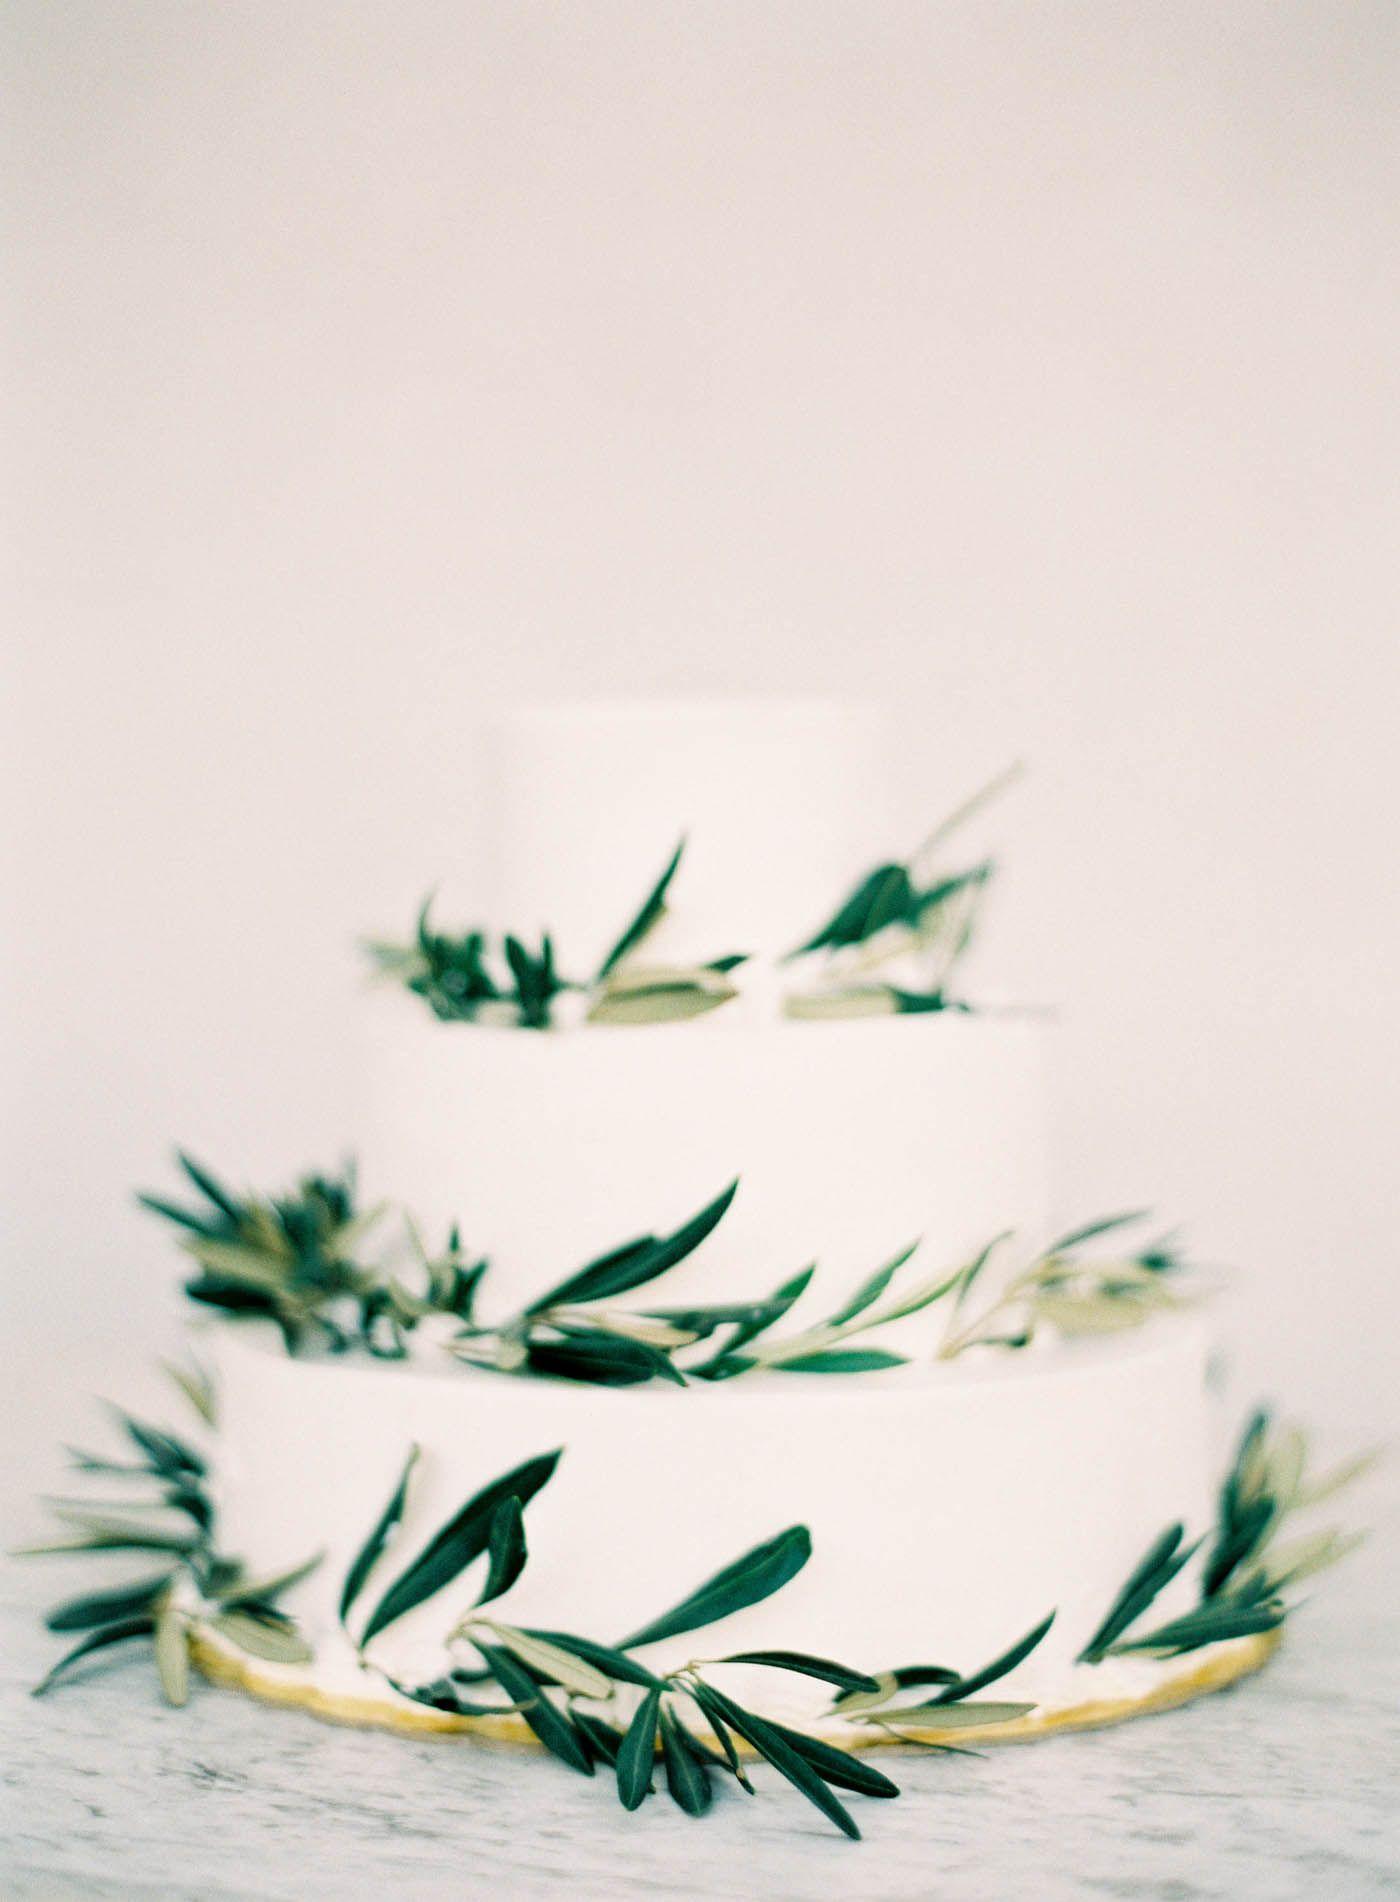 Santorini Wedding | Olive Bouquet | Reem Acra Wedding Dress | Antique Greek Car Rental | Navy Blue Suits | Light Blue Bridesmaids Dresses | Greece Wedding | JenHuangPhoto.com